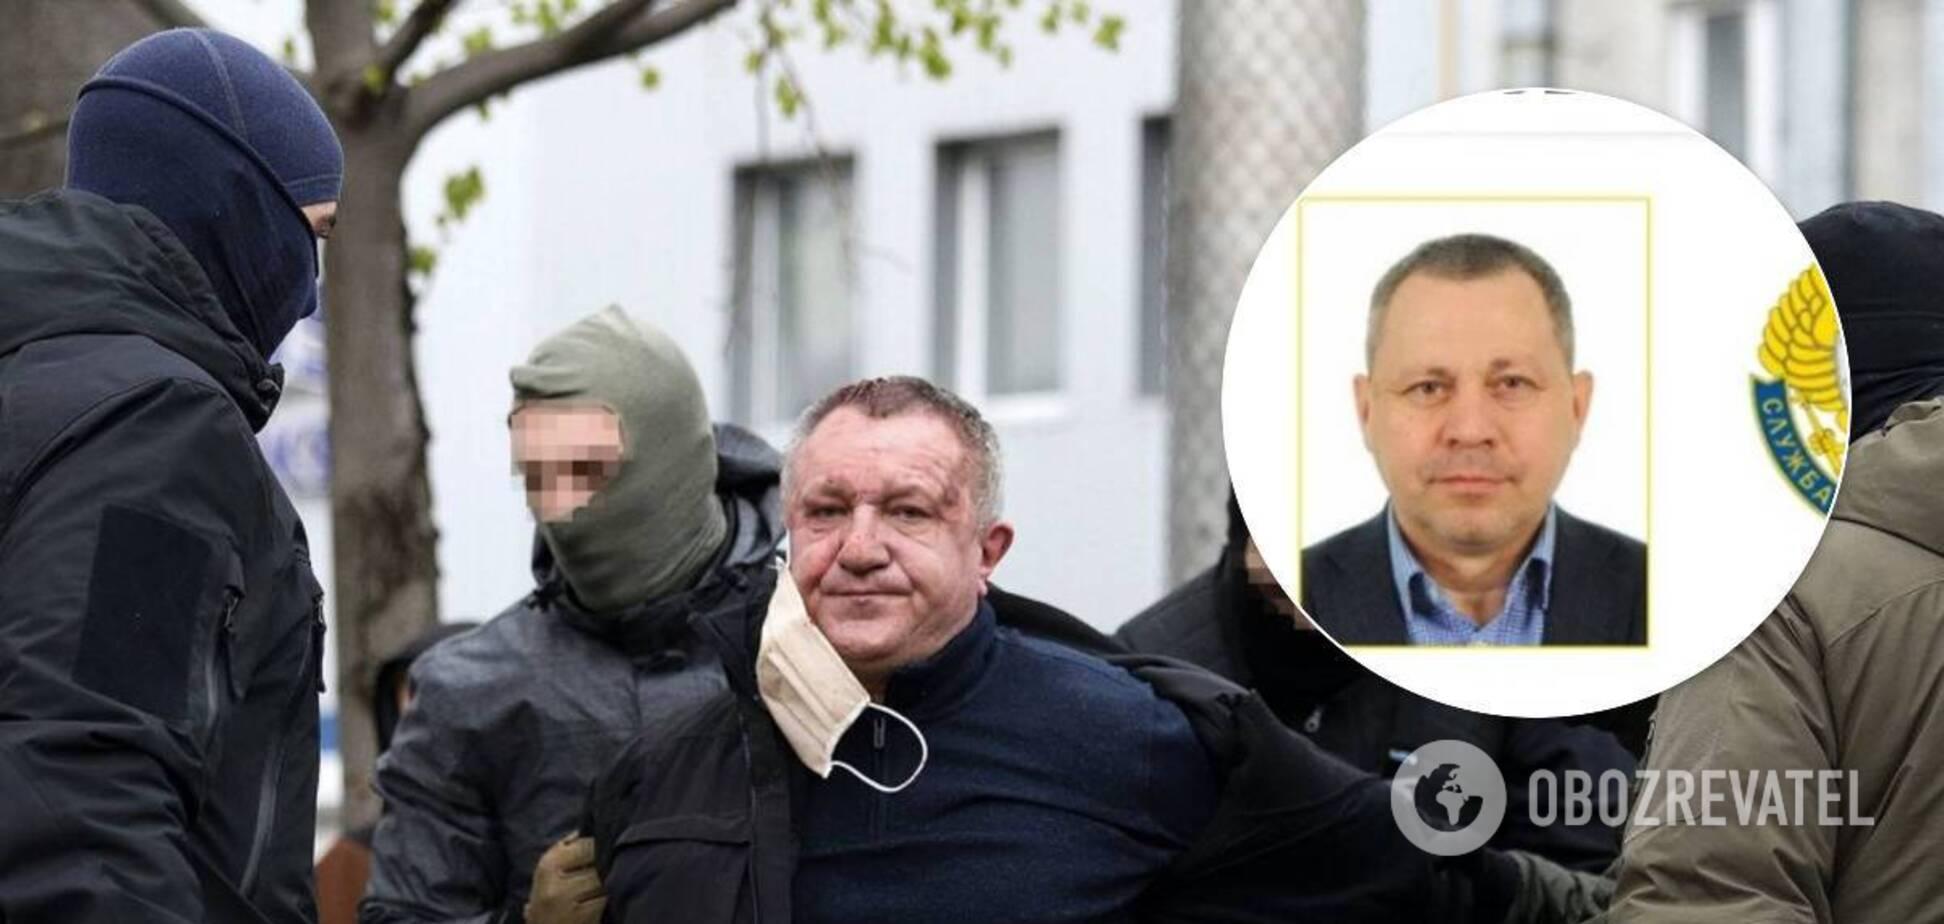 Вербовщик Шайтанова из ФСБ руководил террористами на Донбассе, – СБУ